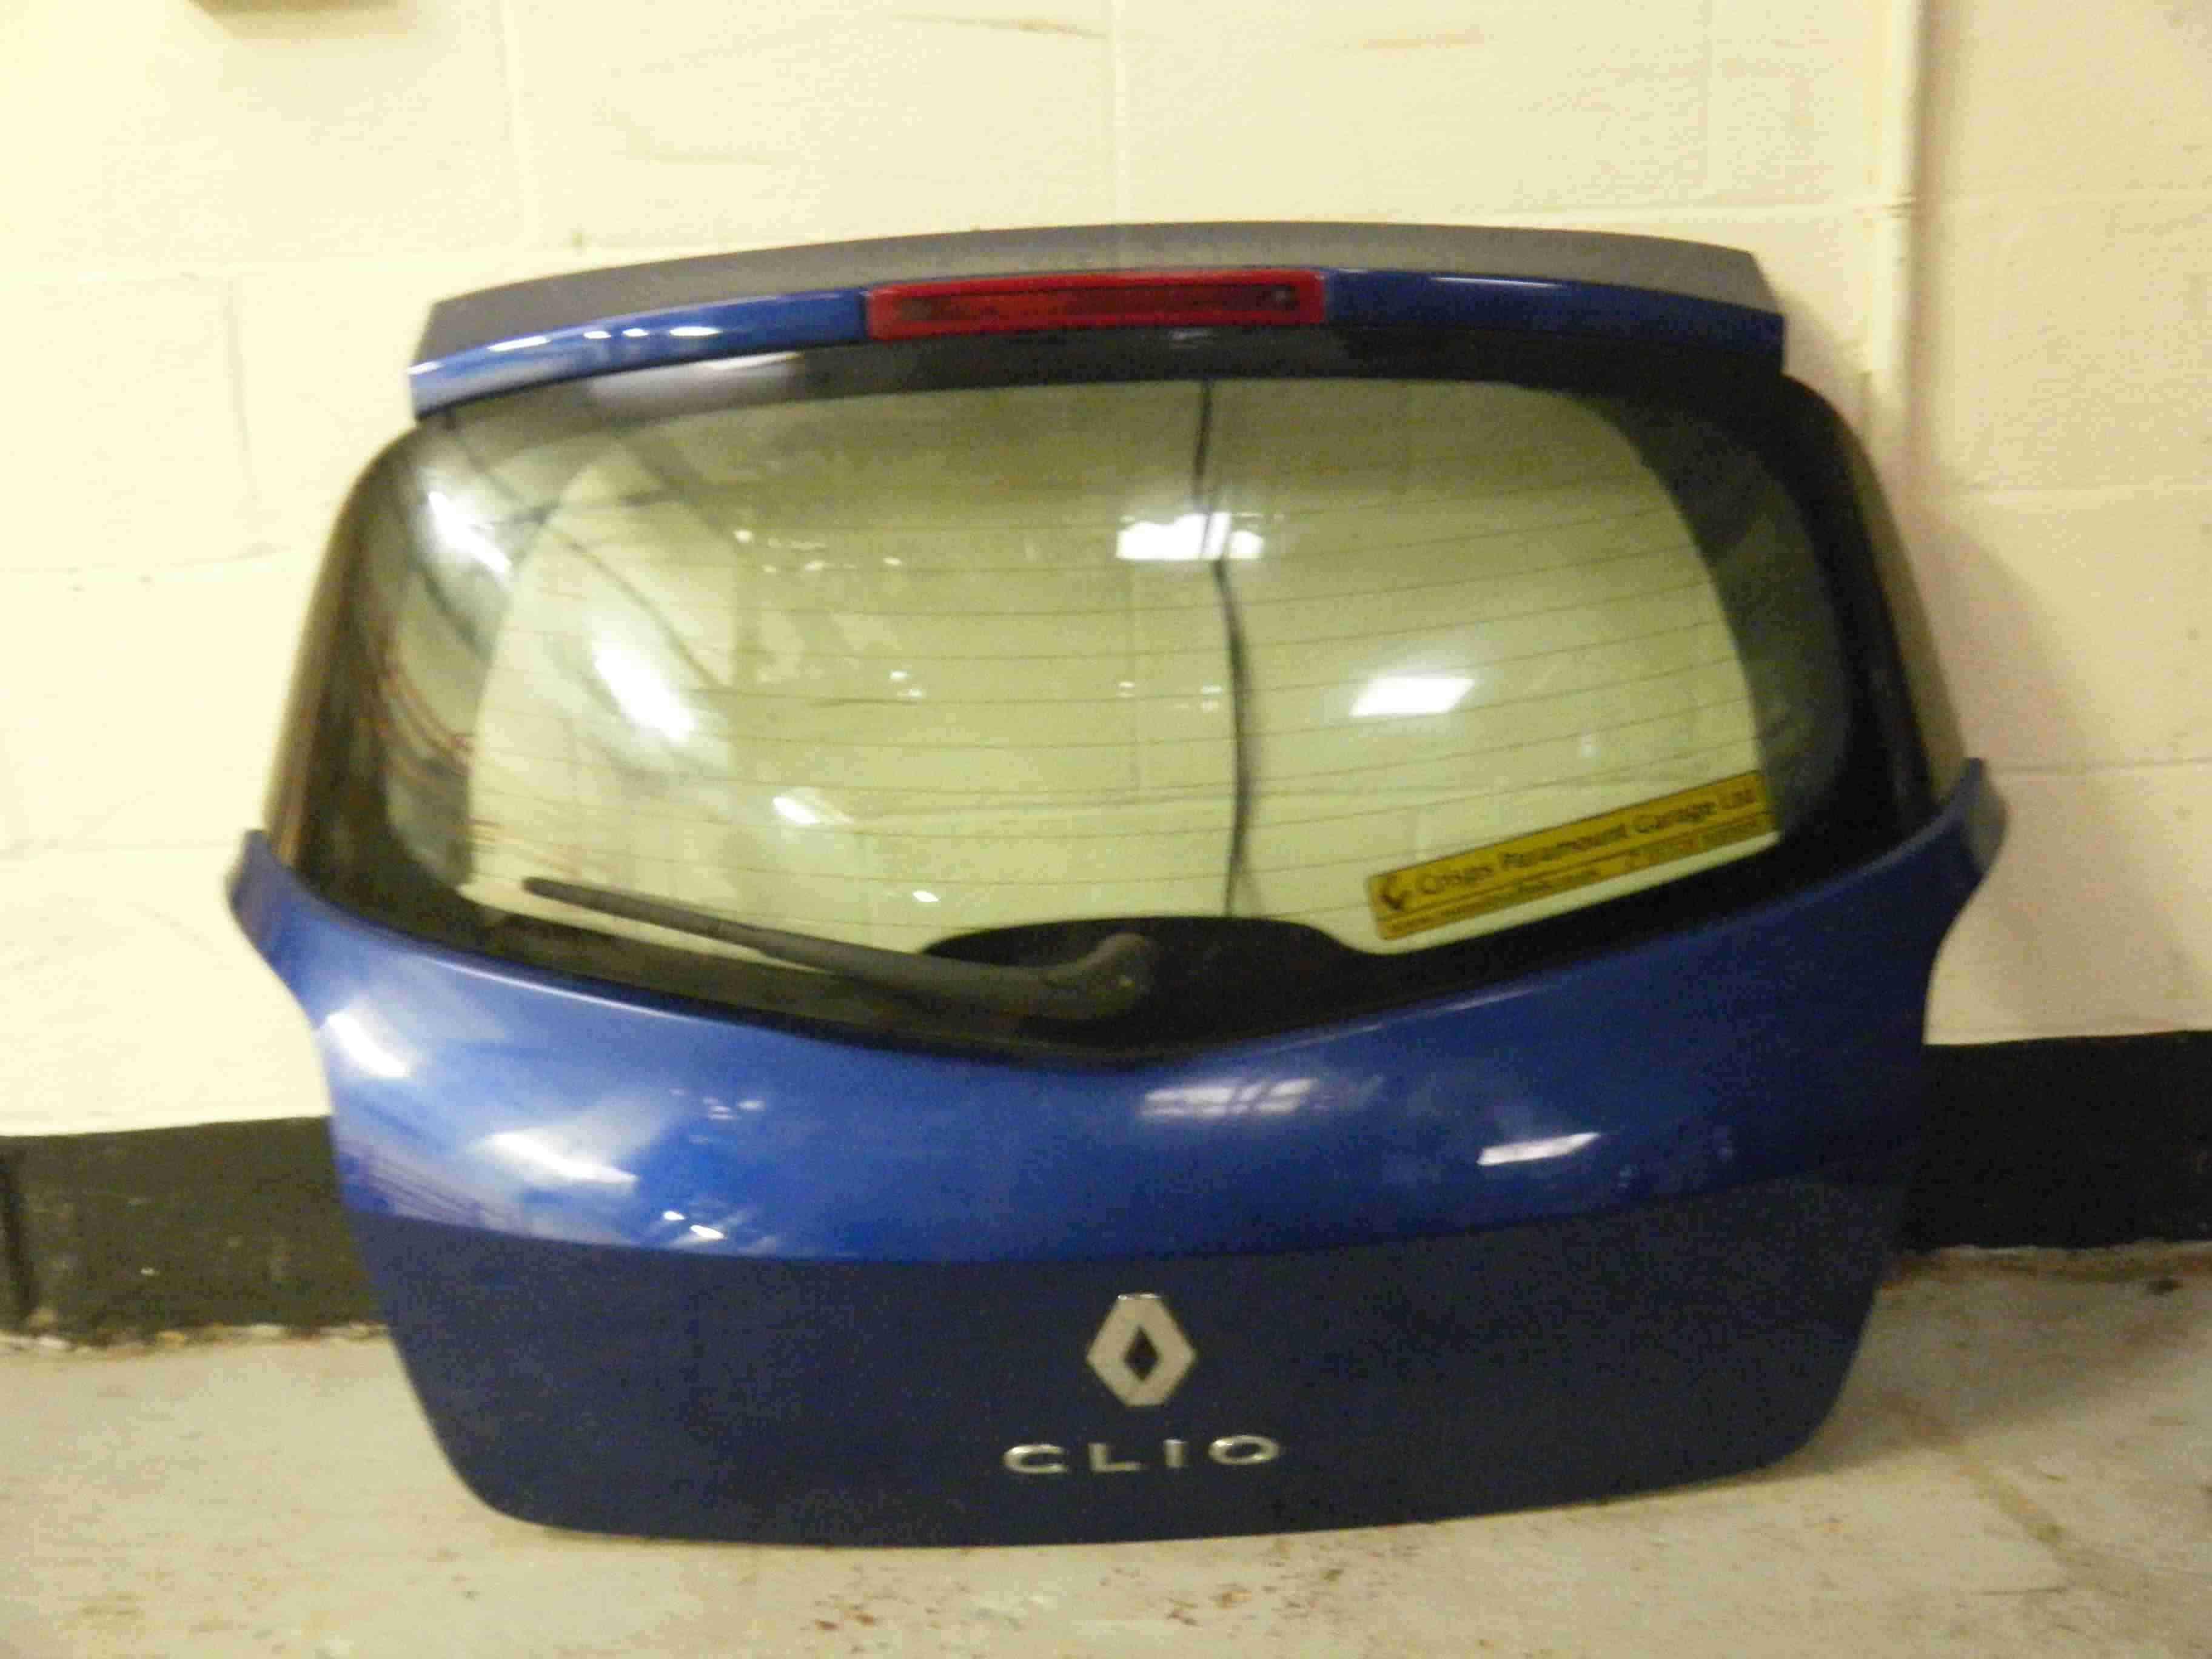 Renault Clio MK3 2005-2012 Rear Boot Tailgate Blue TERNA